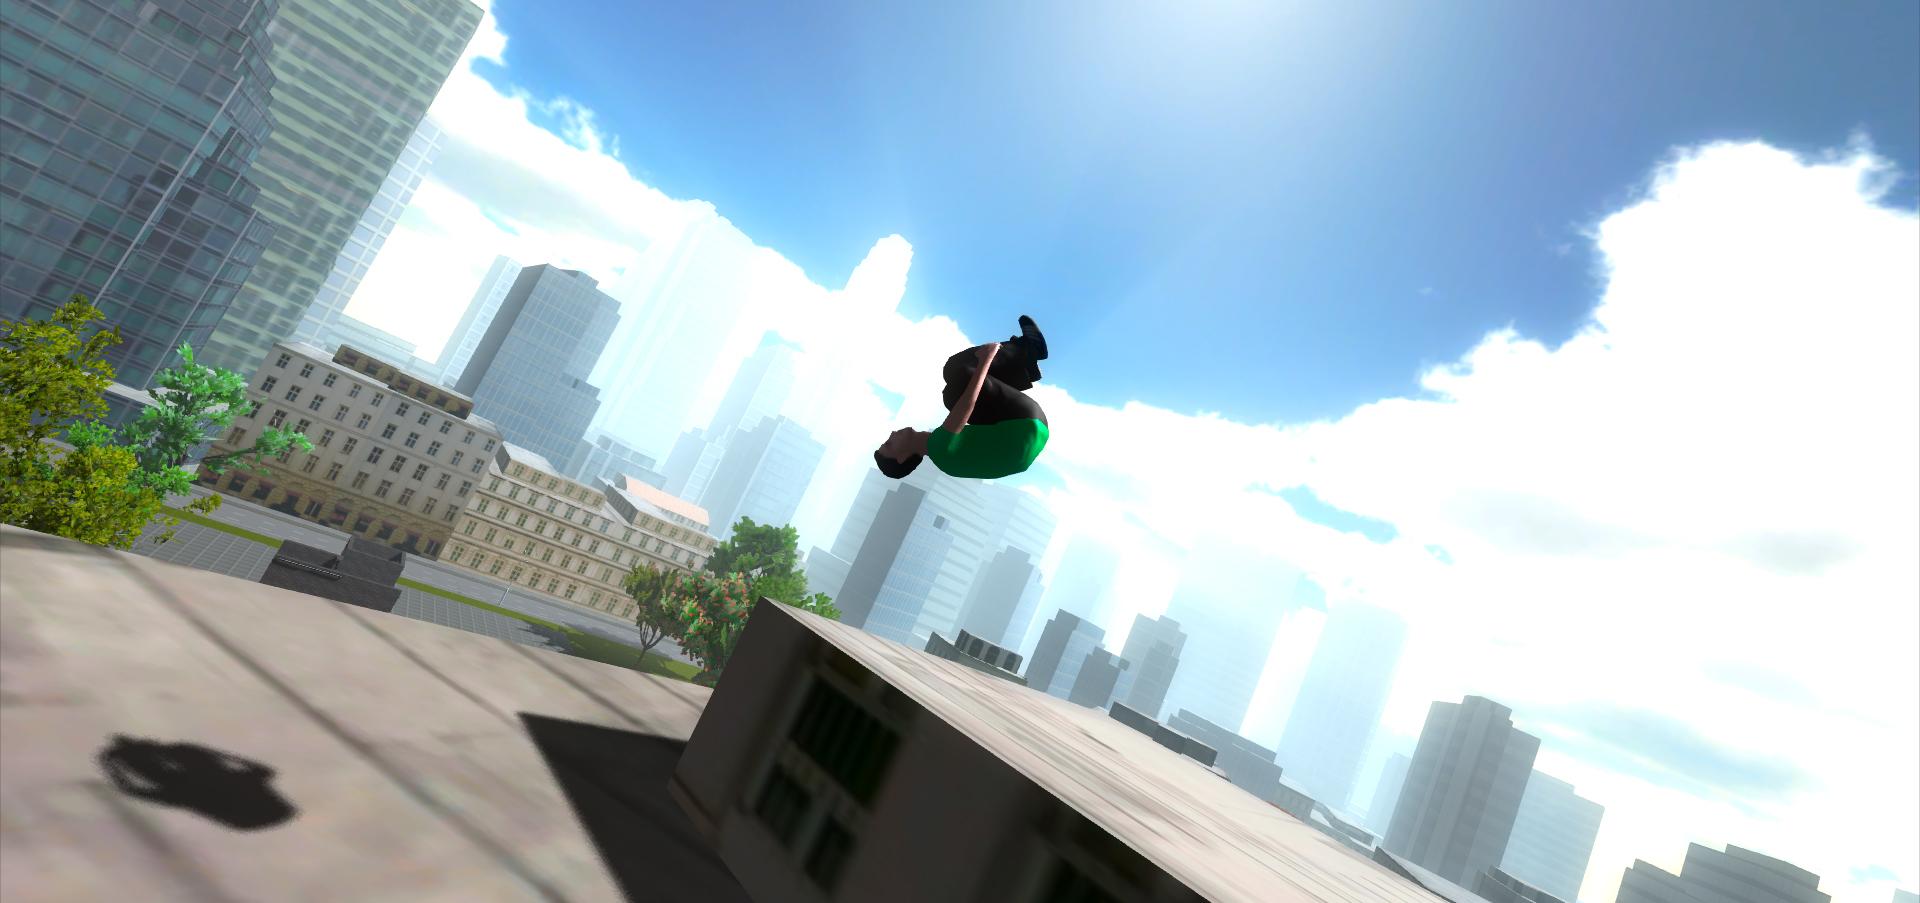 Free 3D Parkour Game Download | joinblog